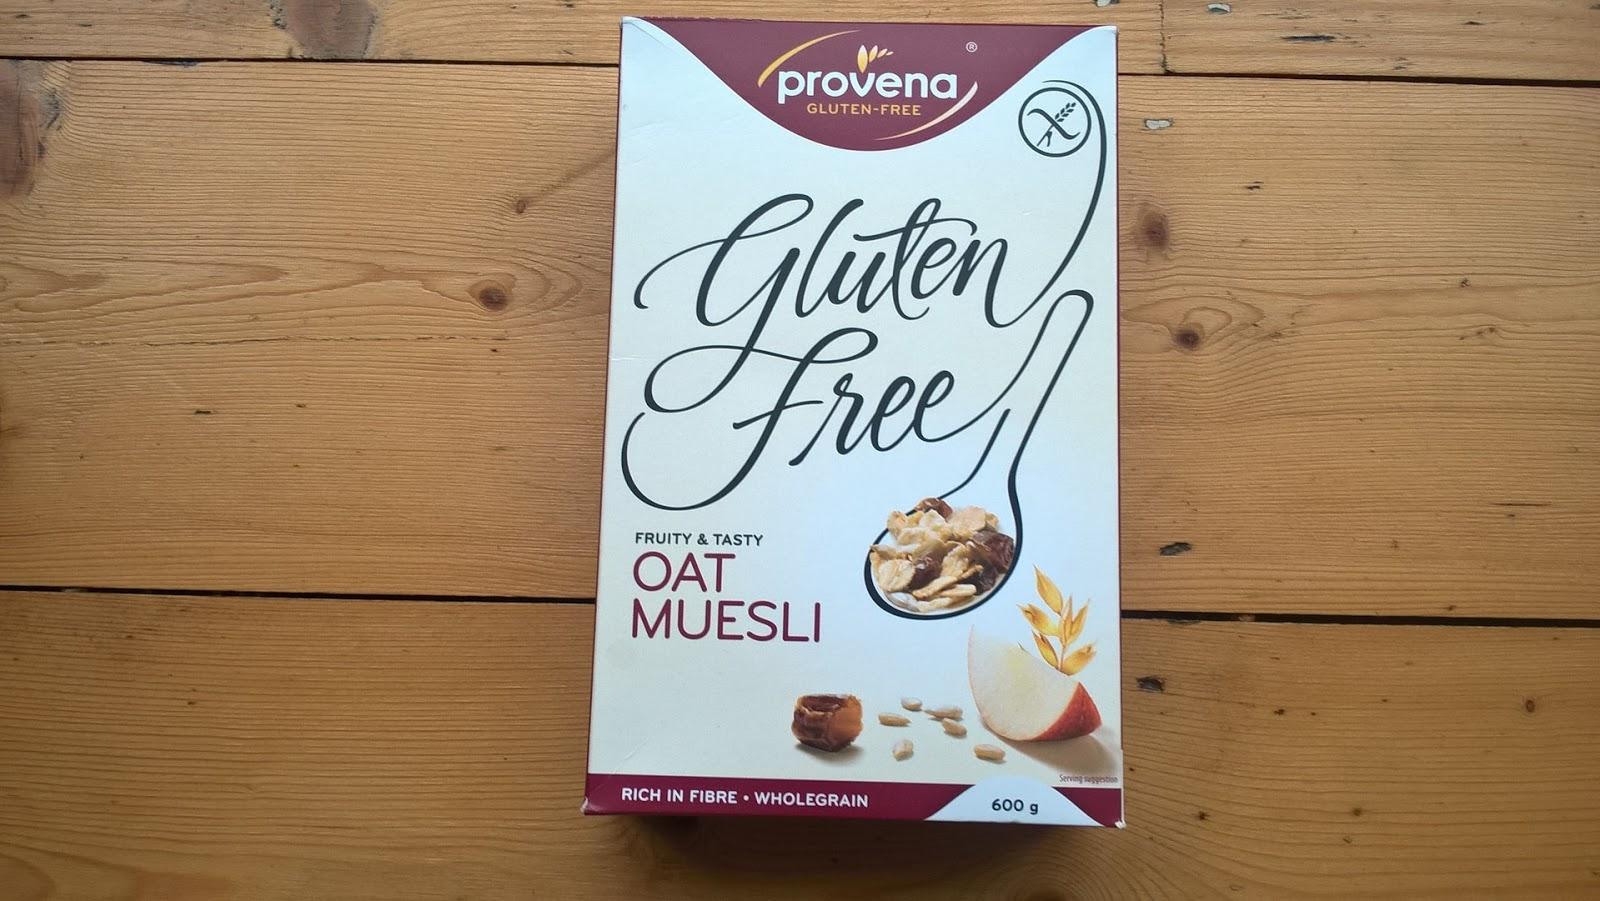 Provena Gluten Free Oat Museli